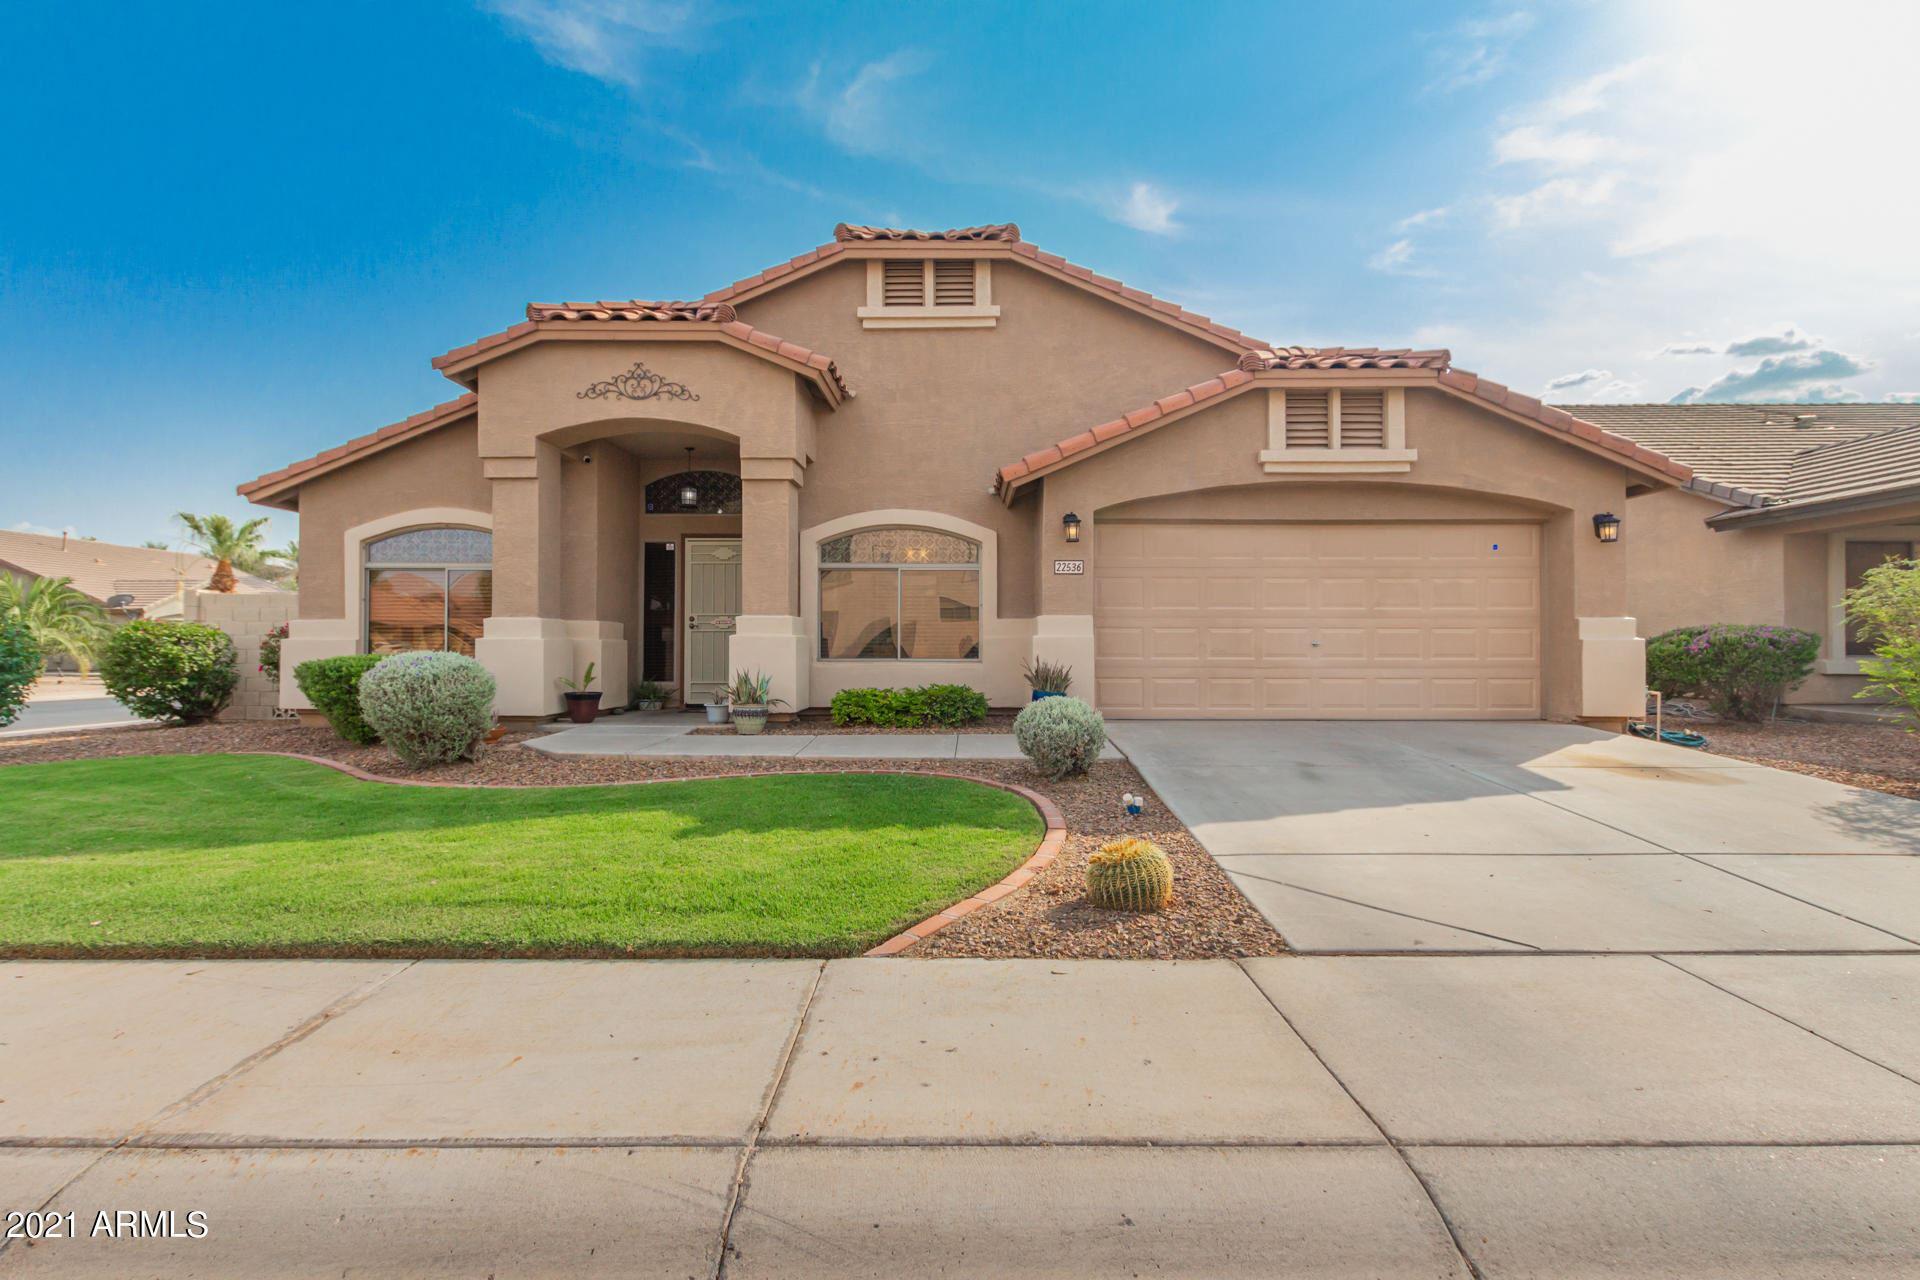 Photo for 22536 N HALEY Drive, Maricopa, AZ 85138 (MLS # 6265198)